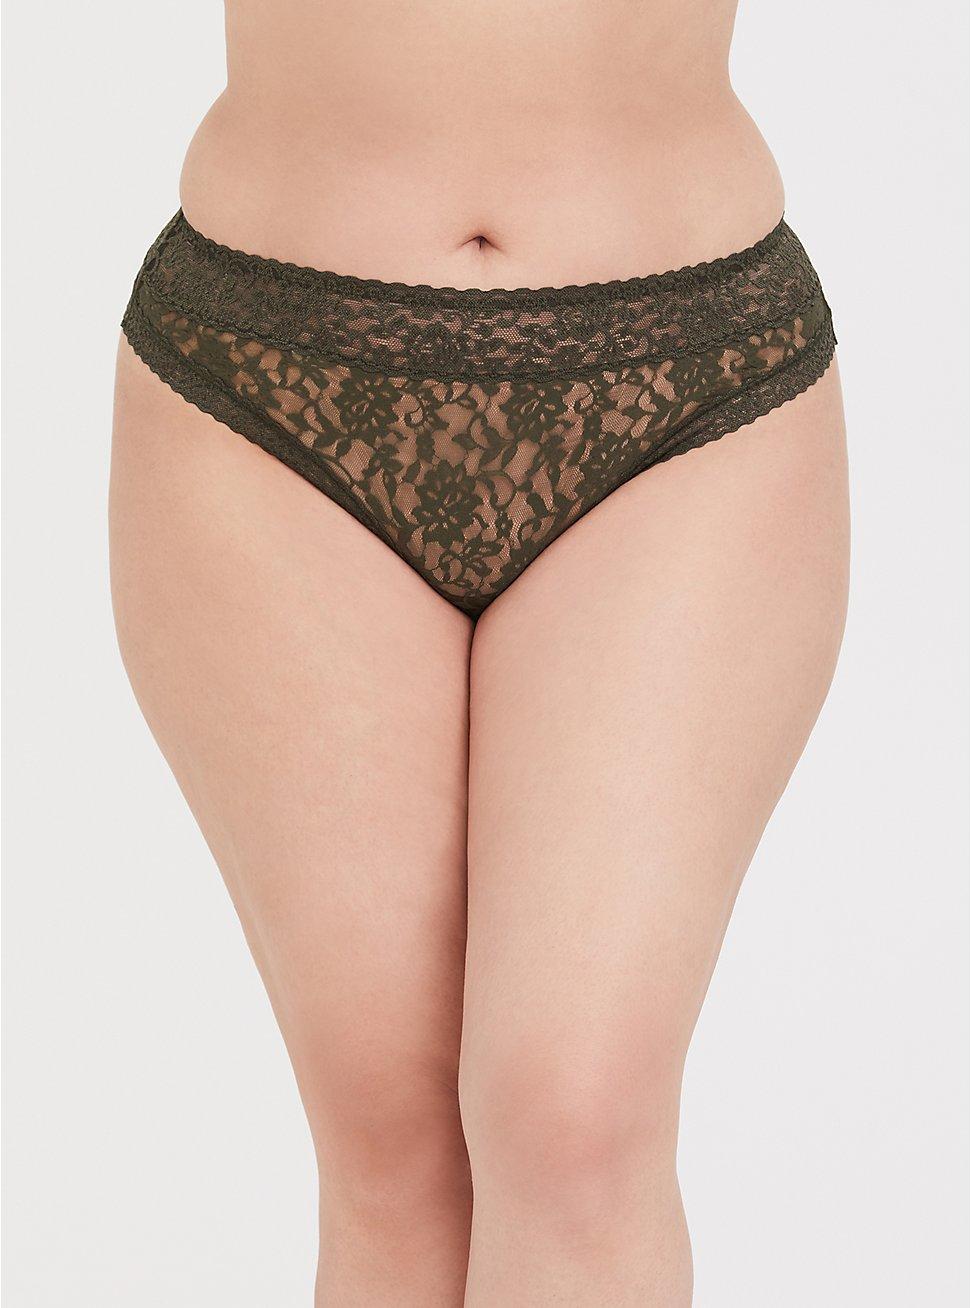 Olive Green Lacey Thong Panty, DEEP DEPTHS, hi-res